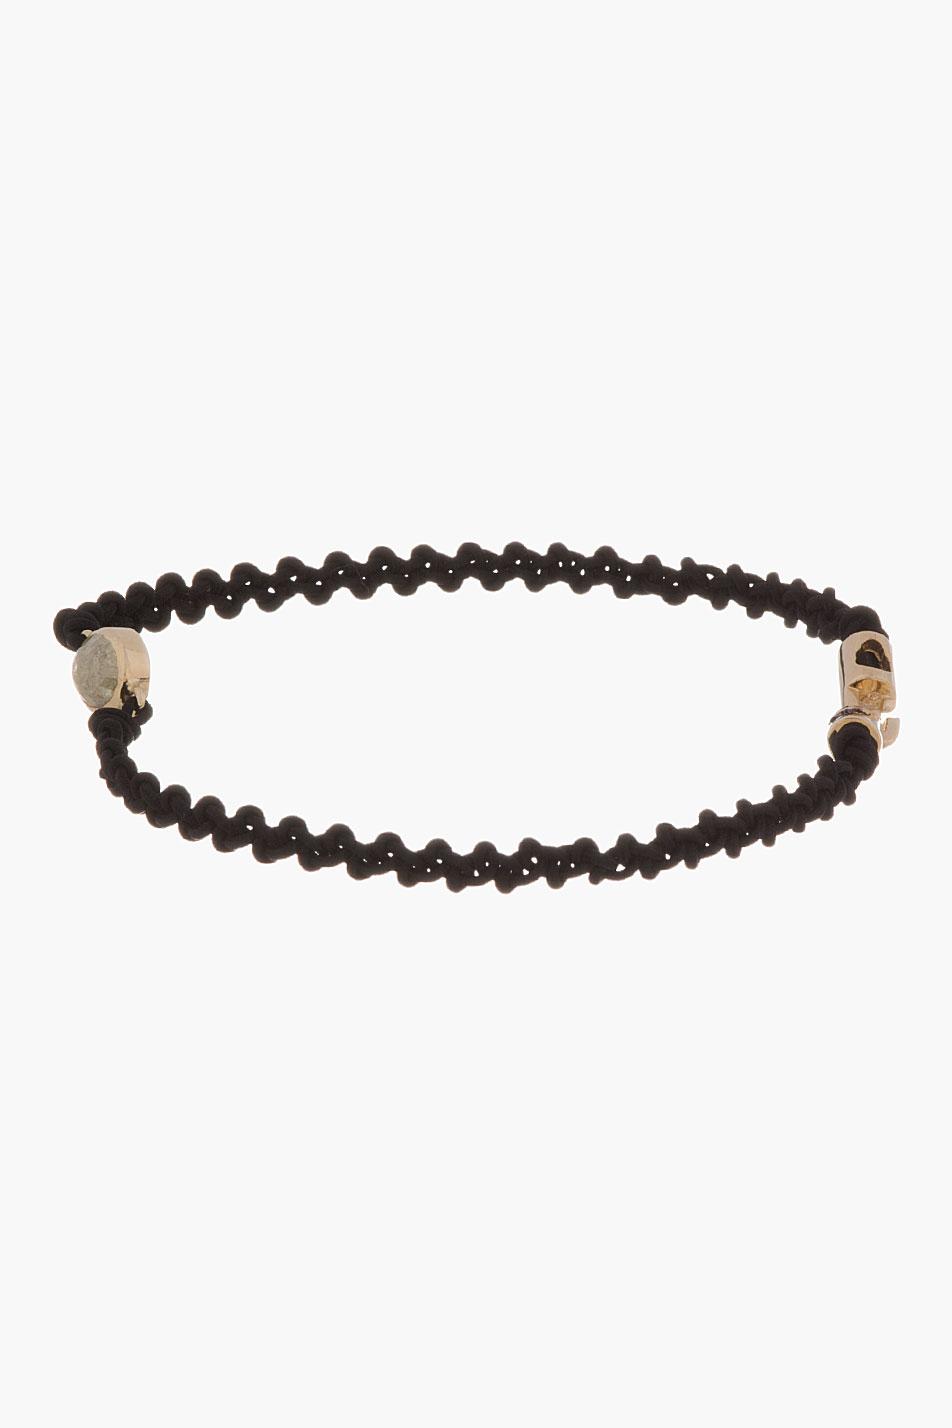 14-karat Gold Diamond Bracelet Luis Morais 9gg46dD